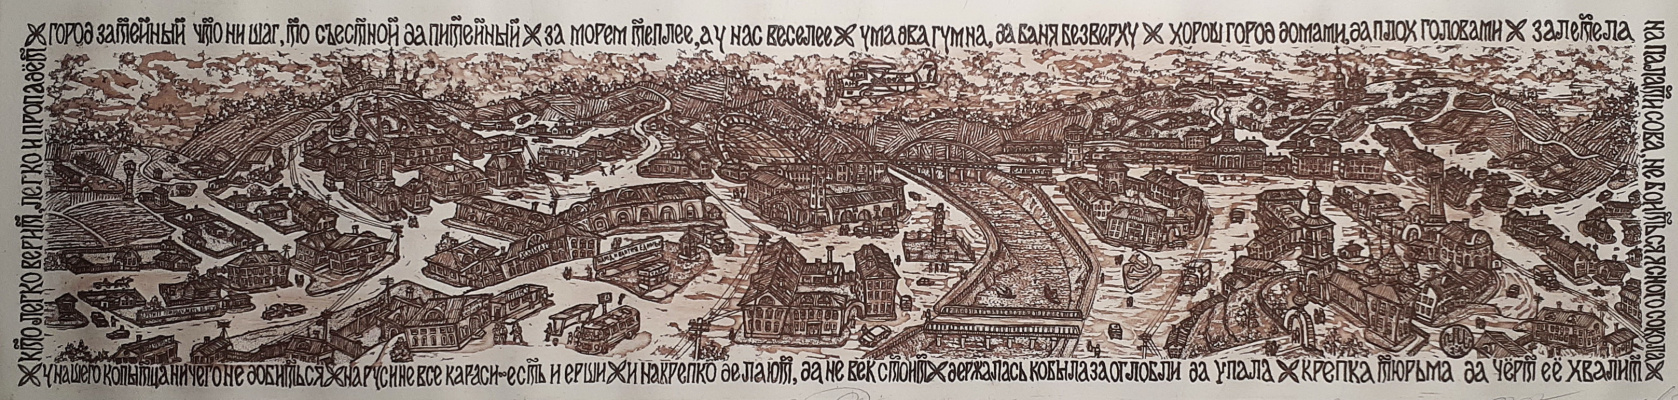 Igor Alexandrovich Chernyshov. THE USSR. 70s Province